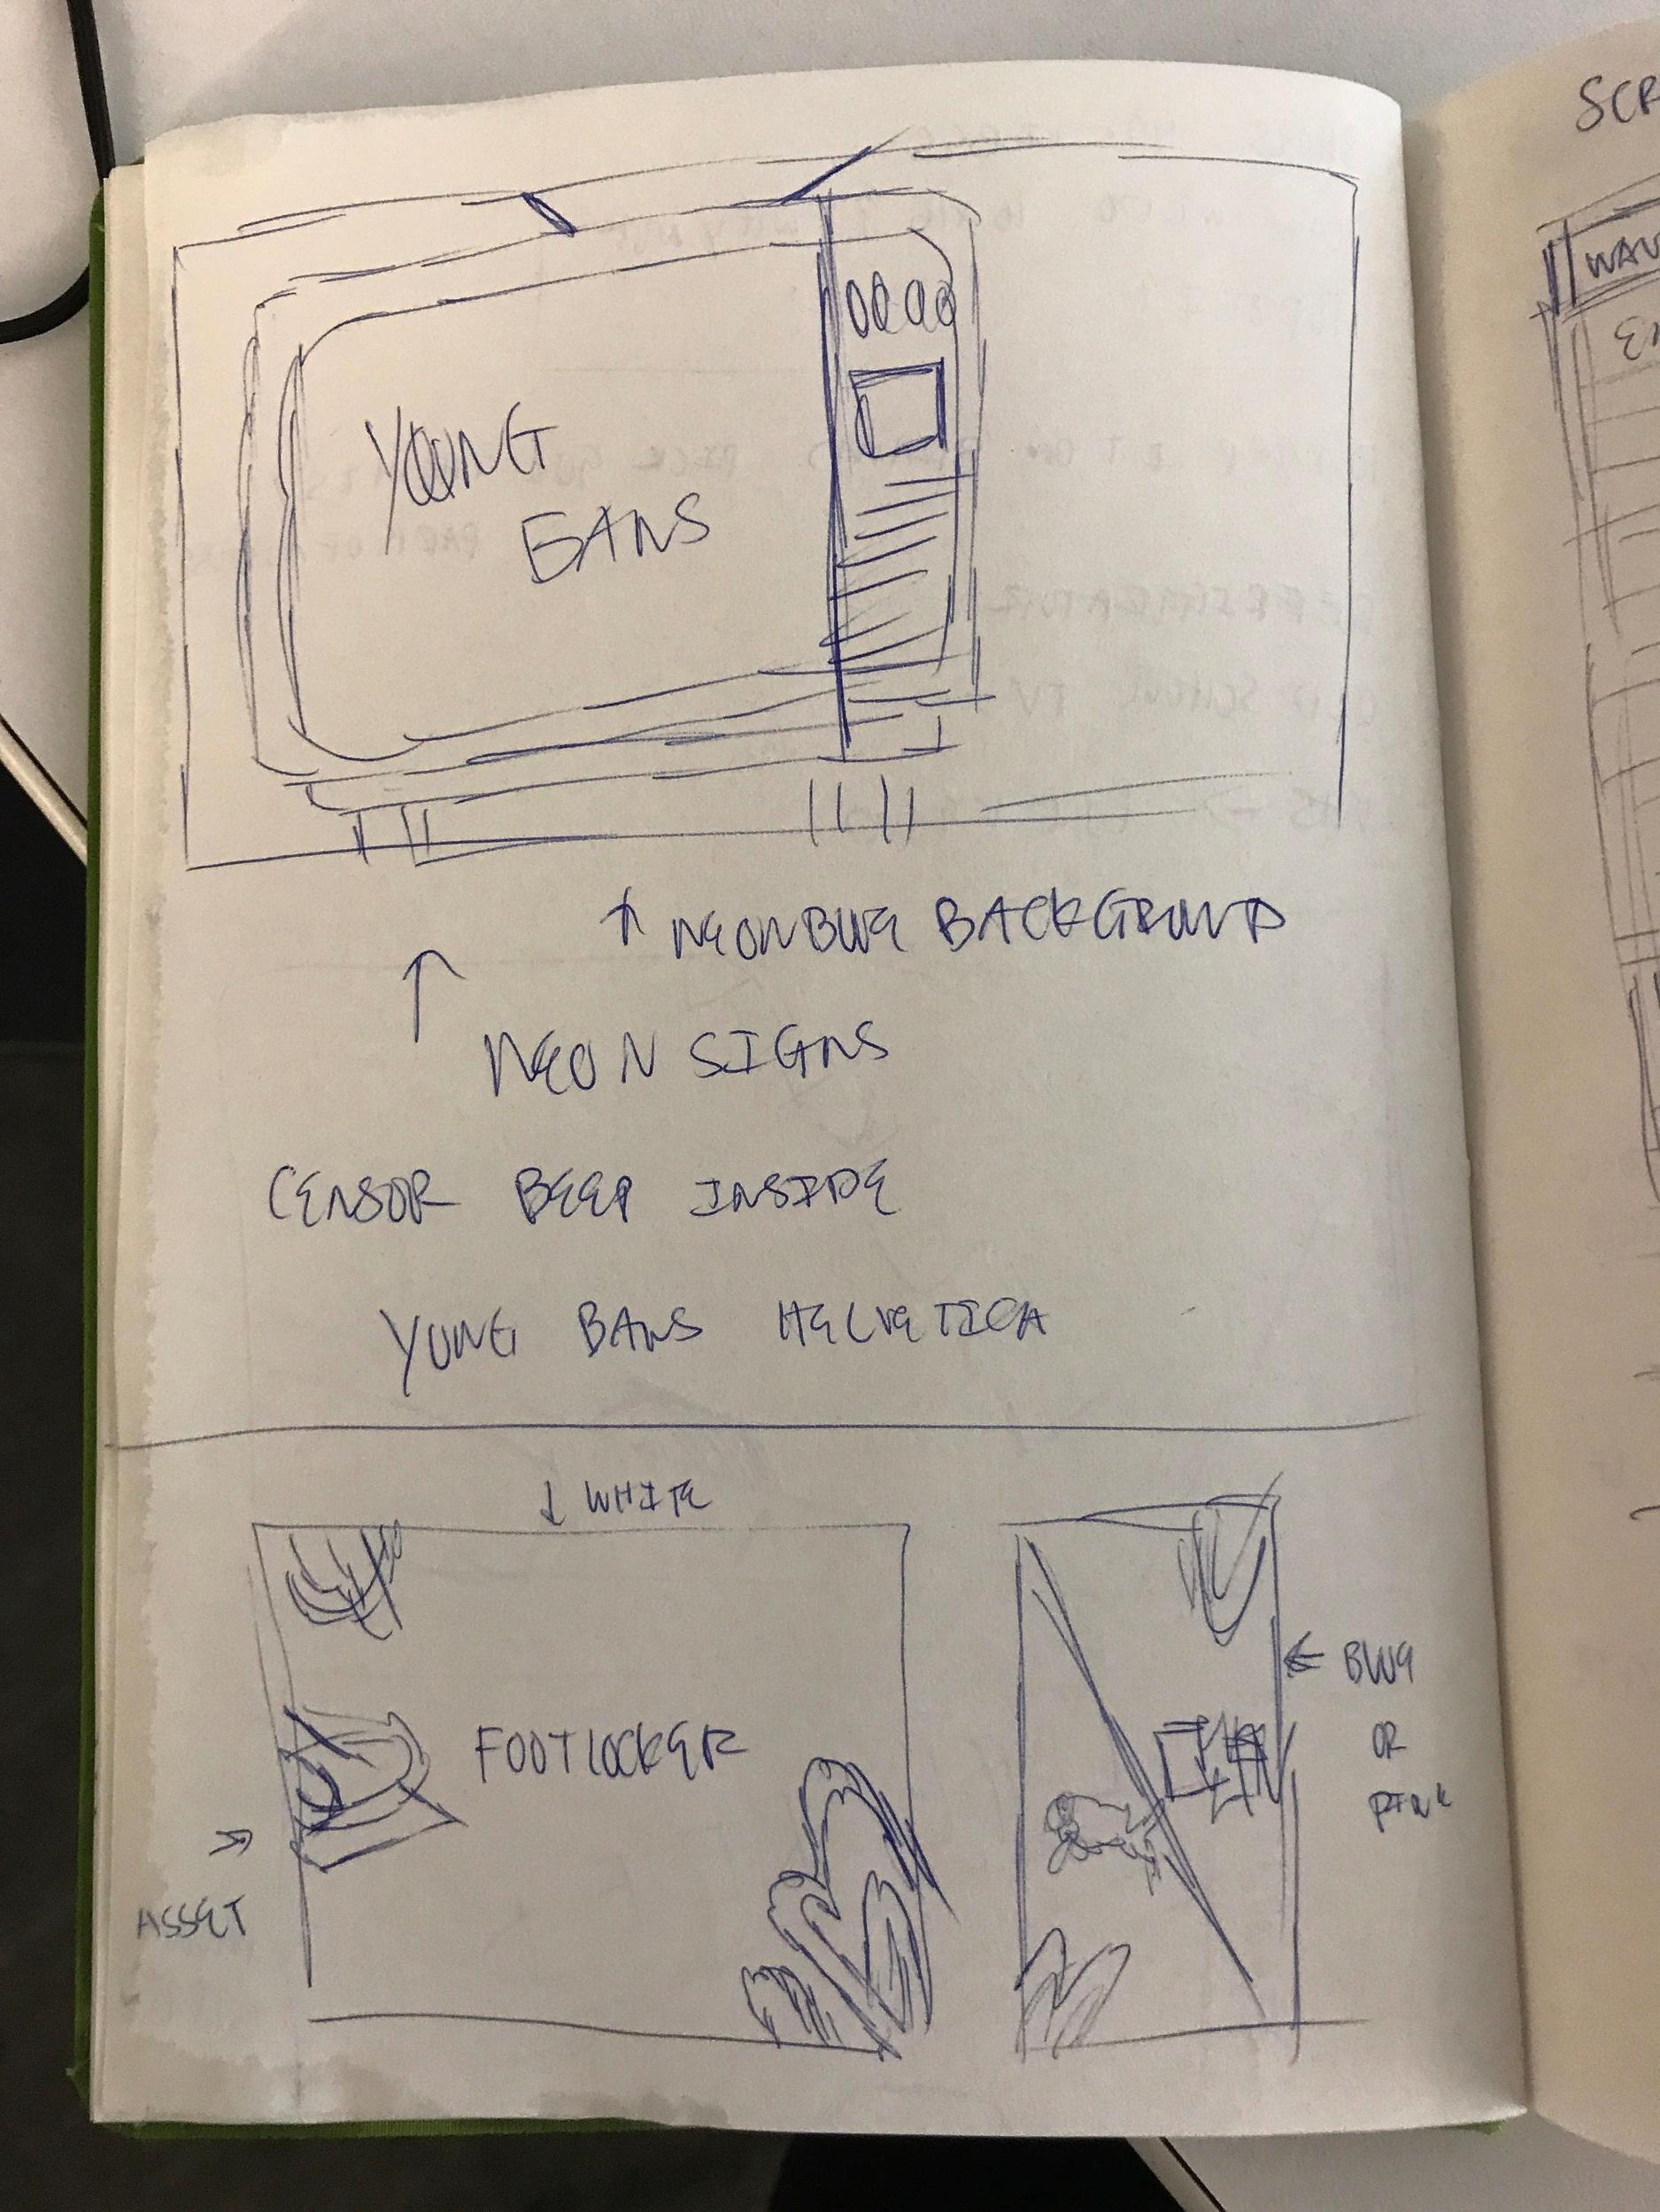 yung bans sketch.jpg